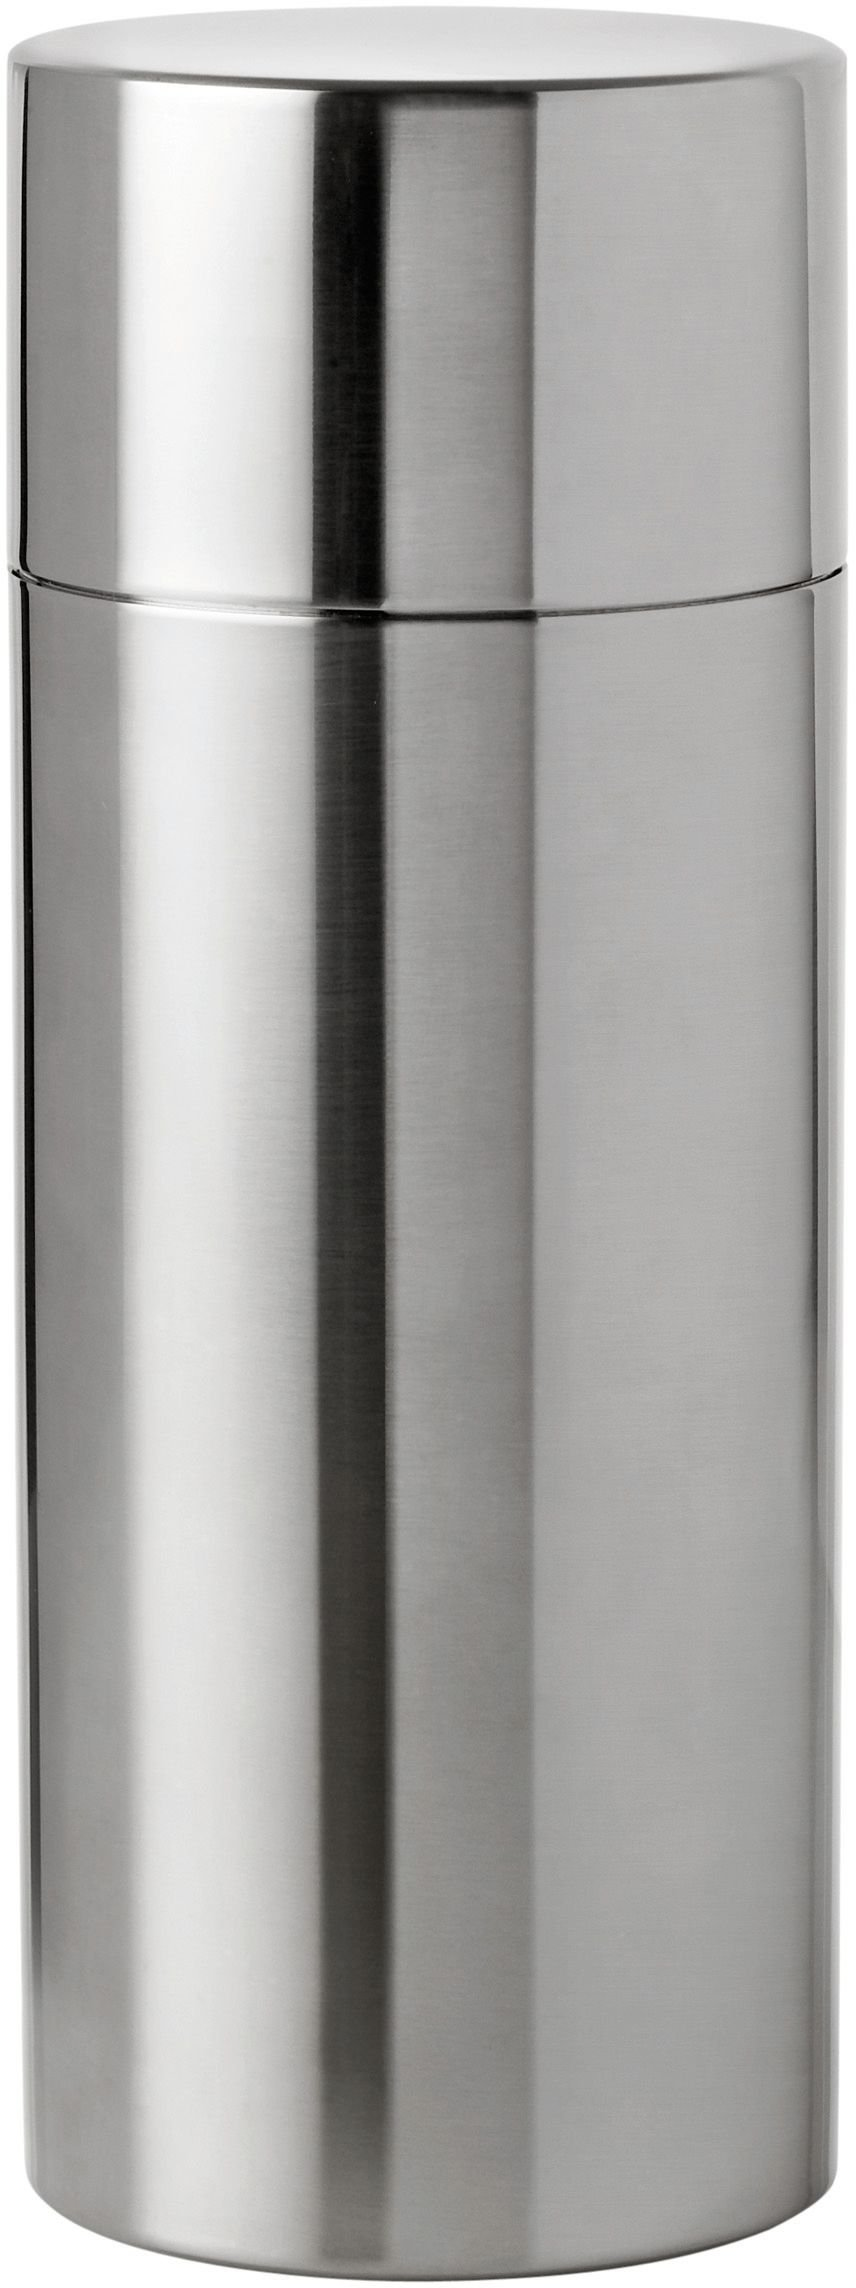 Stelton AJ Cylinda Line Cocktail Shaker - 0,75 Liter